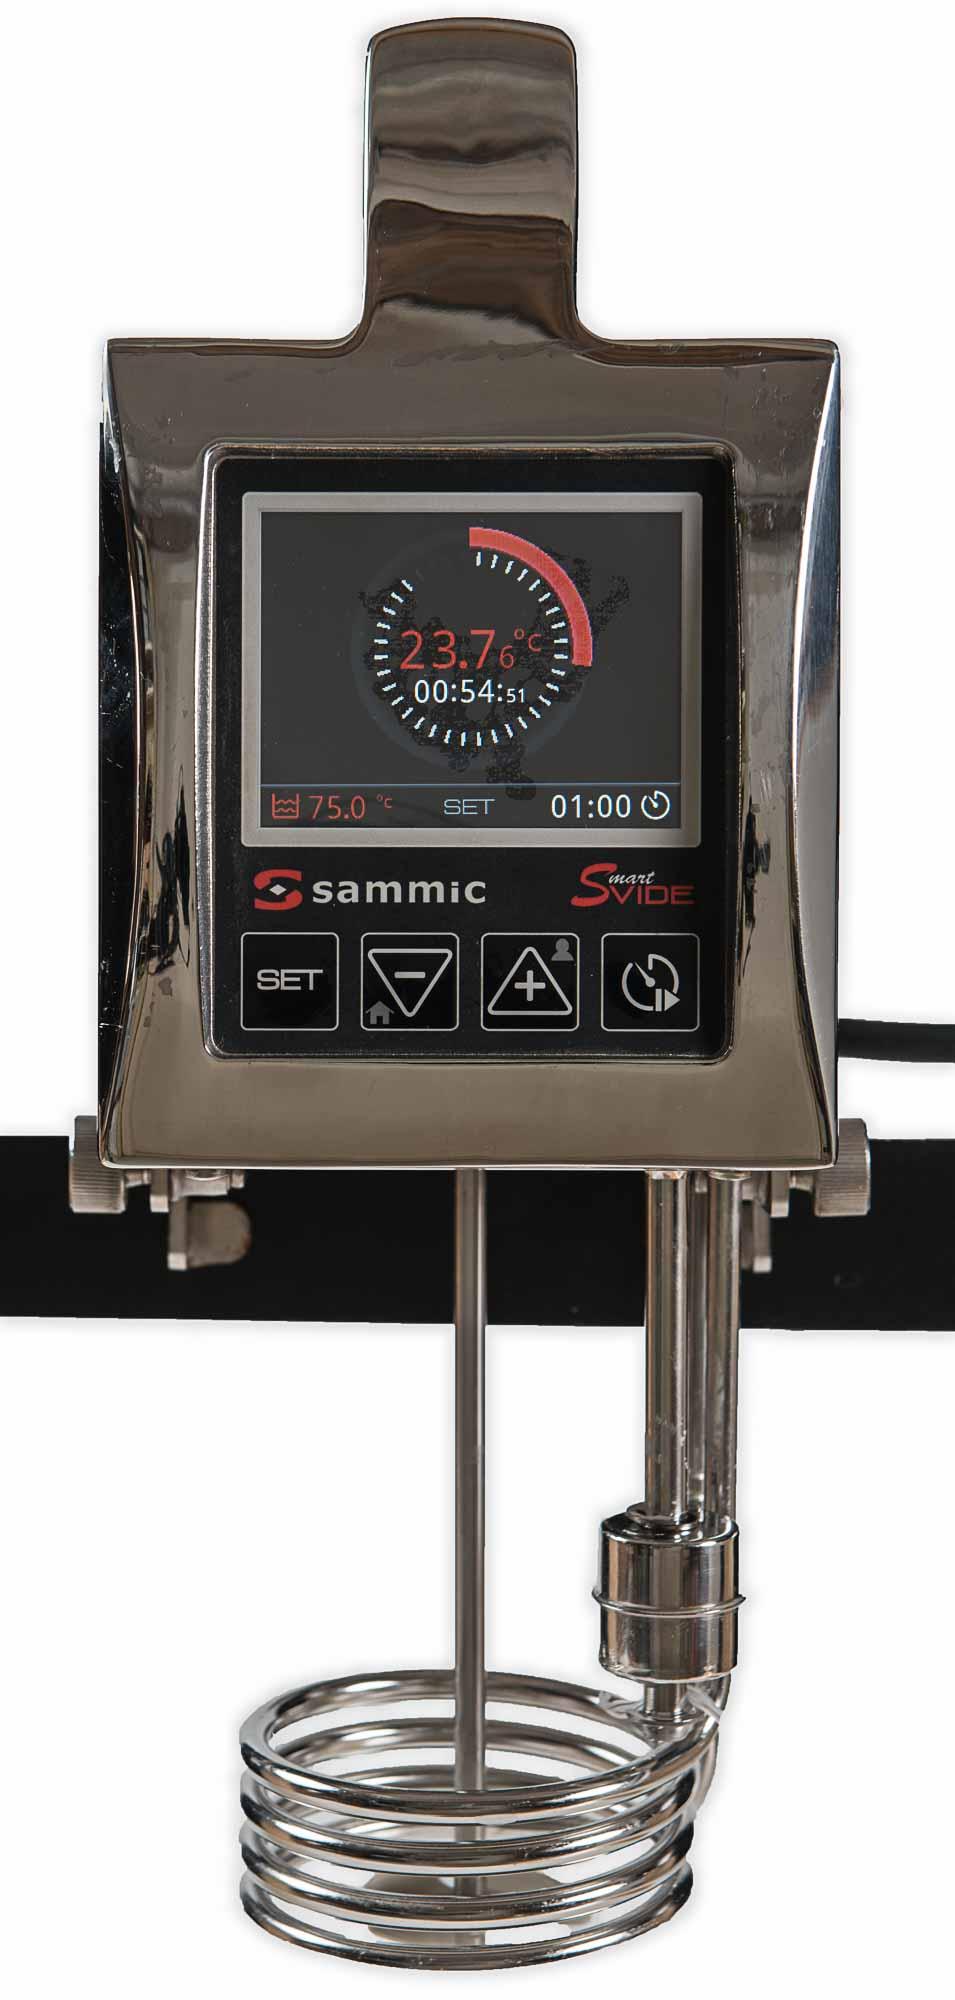 sammic_smartvide8plus_02